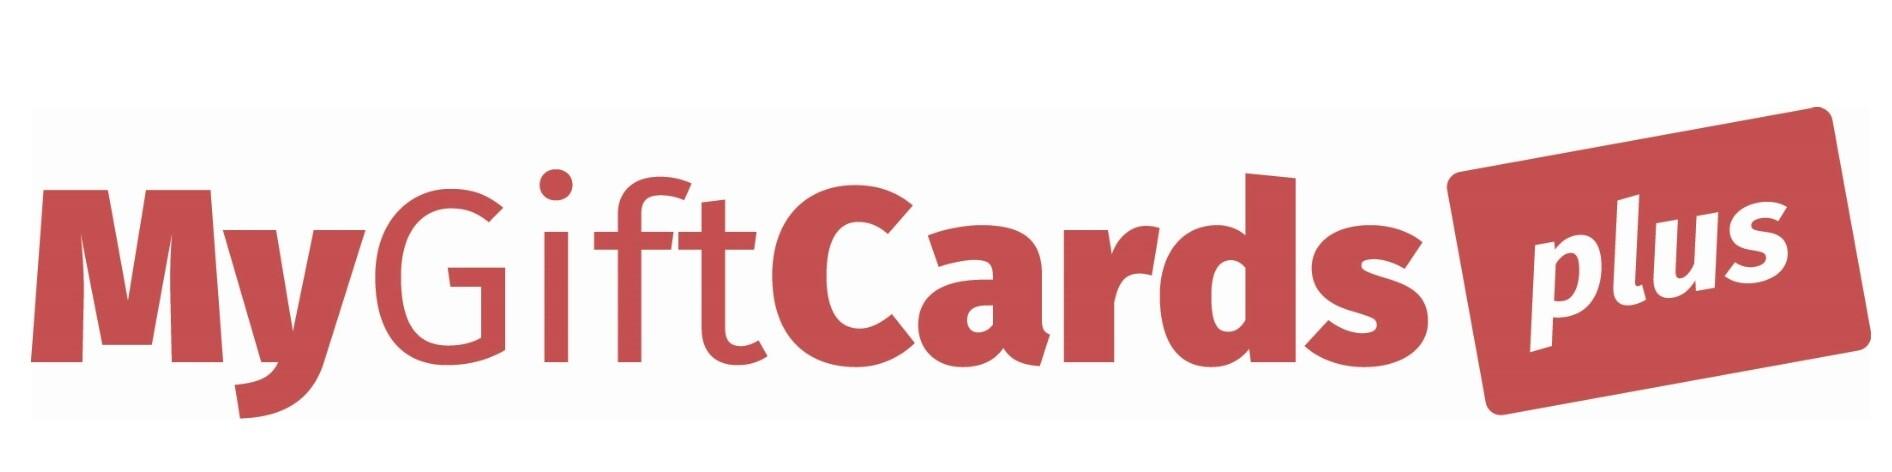 MyGiftCardsPlus_US Logo